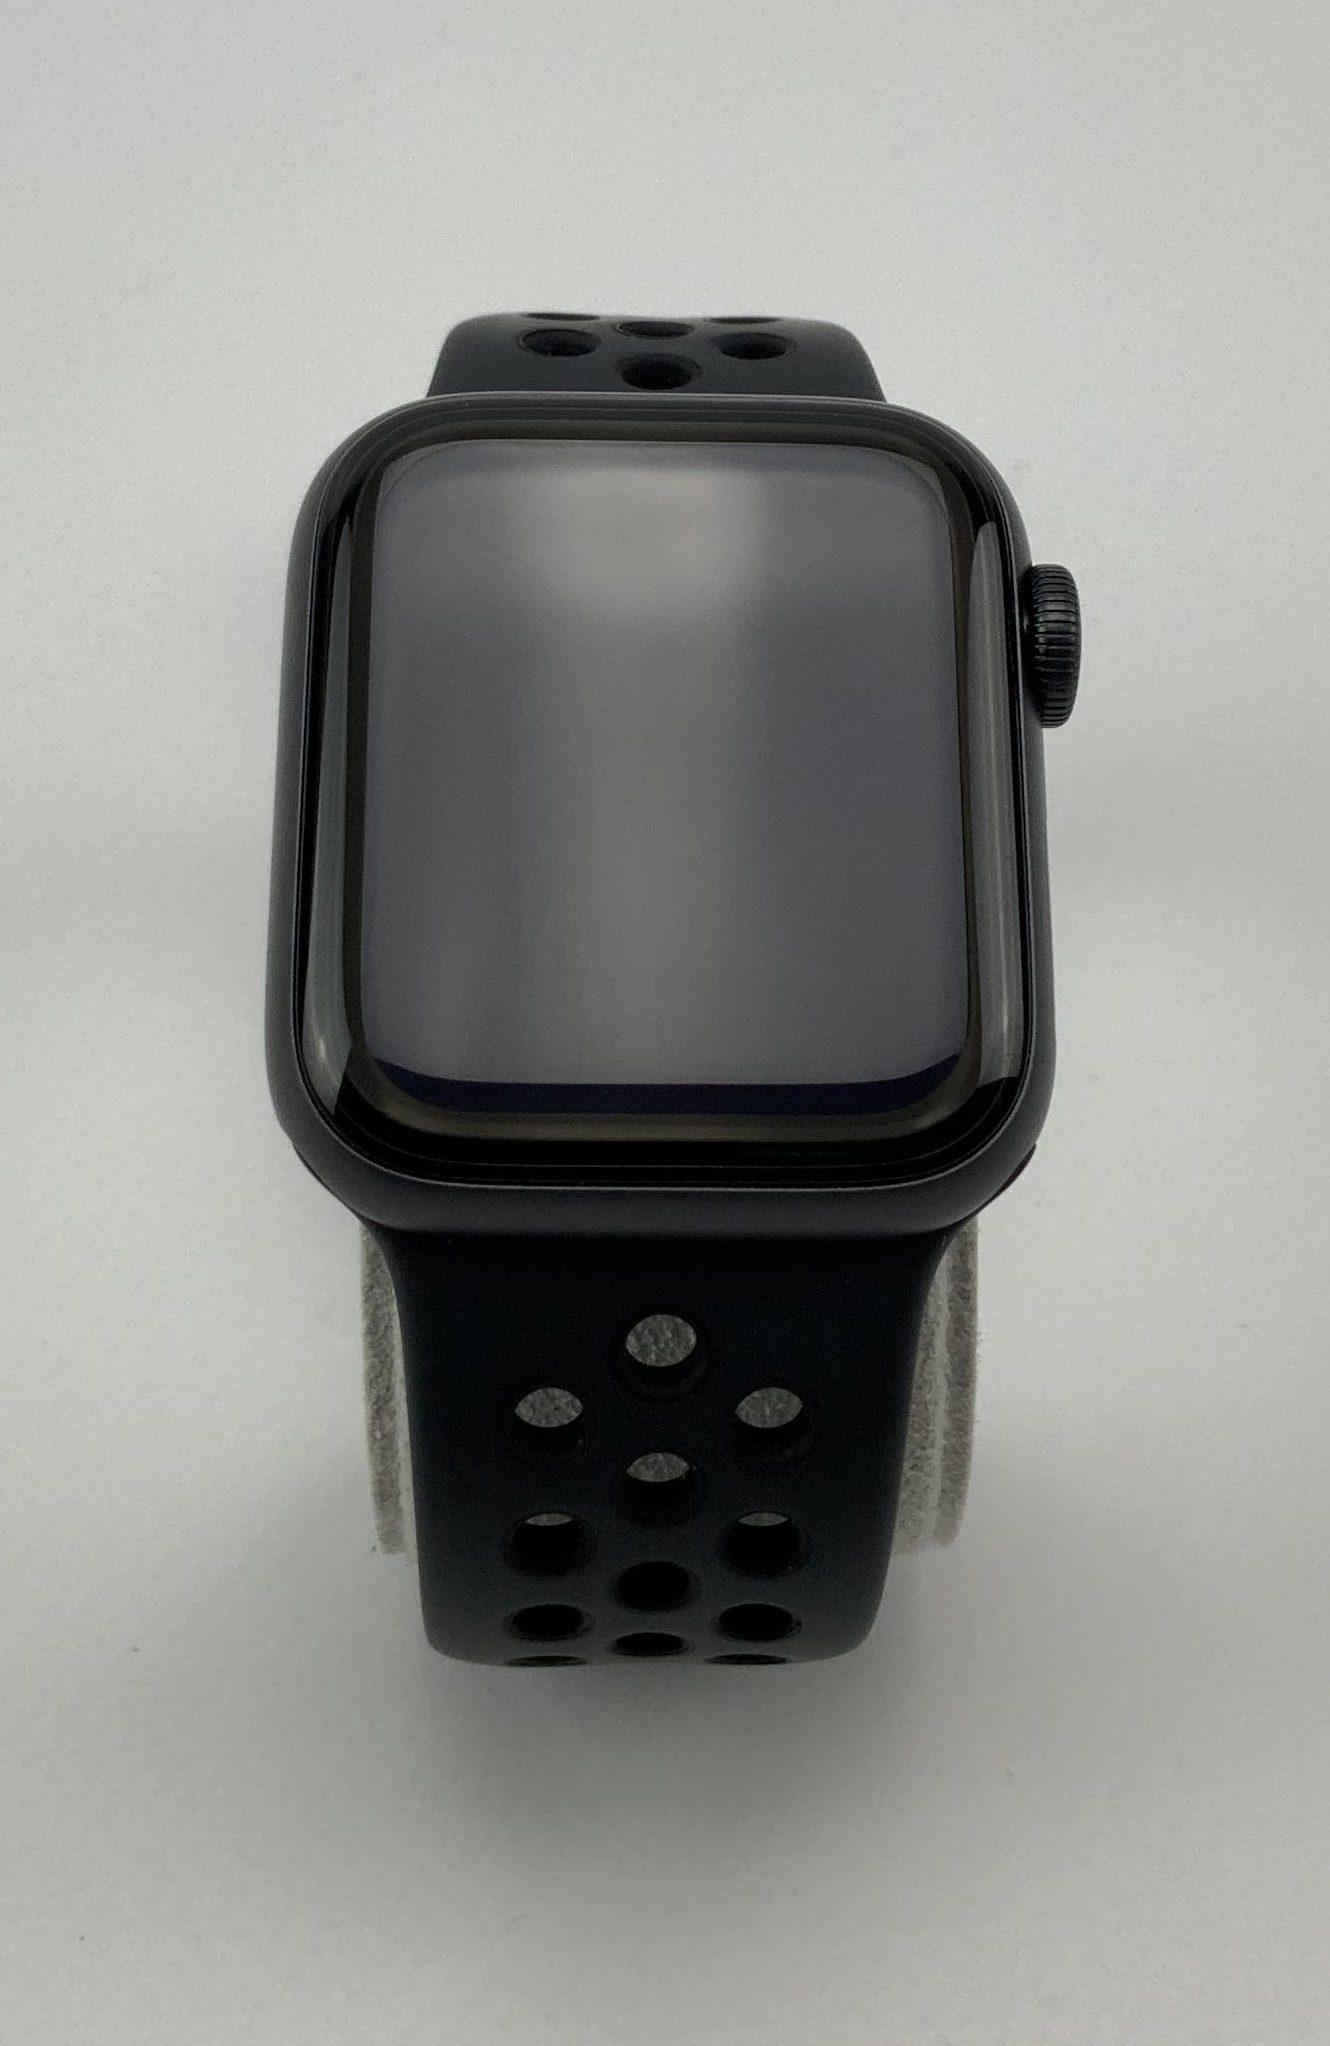 Watch Series 6 Steel Cellular (40mm), Space Black, obraz 1